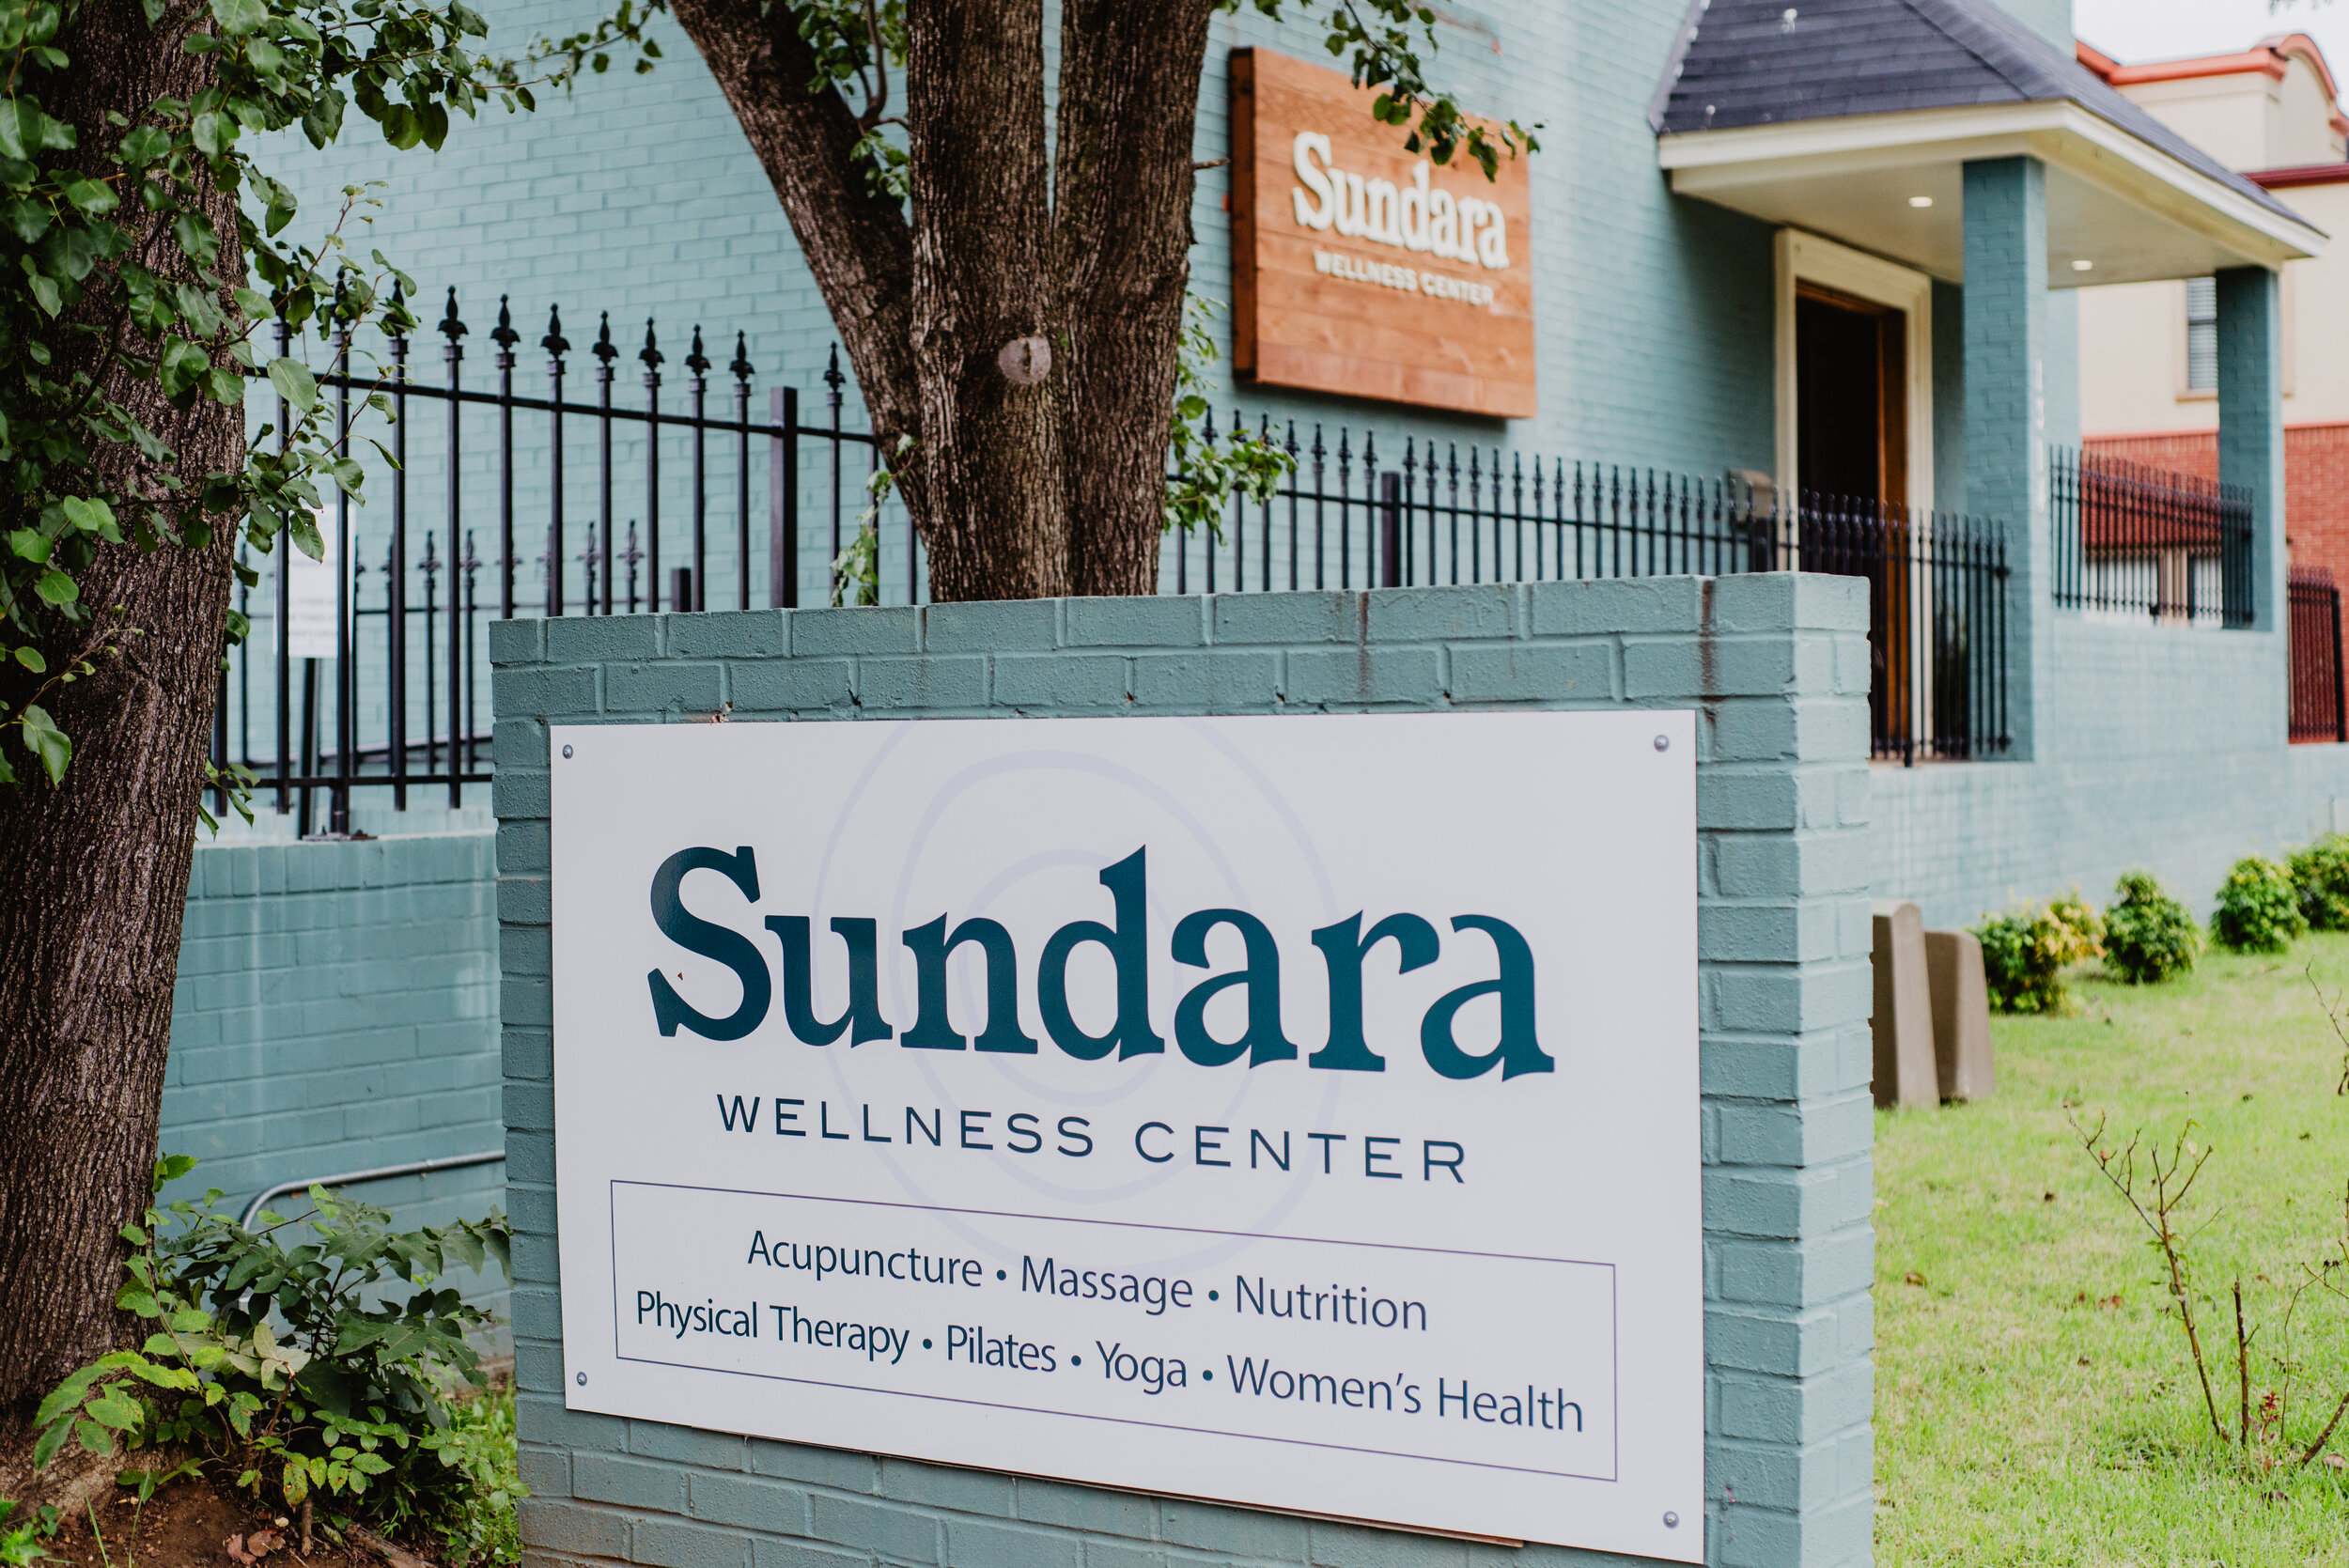 SundaraWellnessCenter.jpg